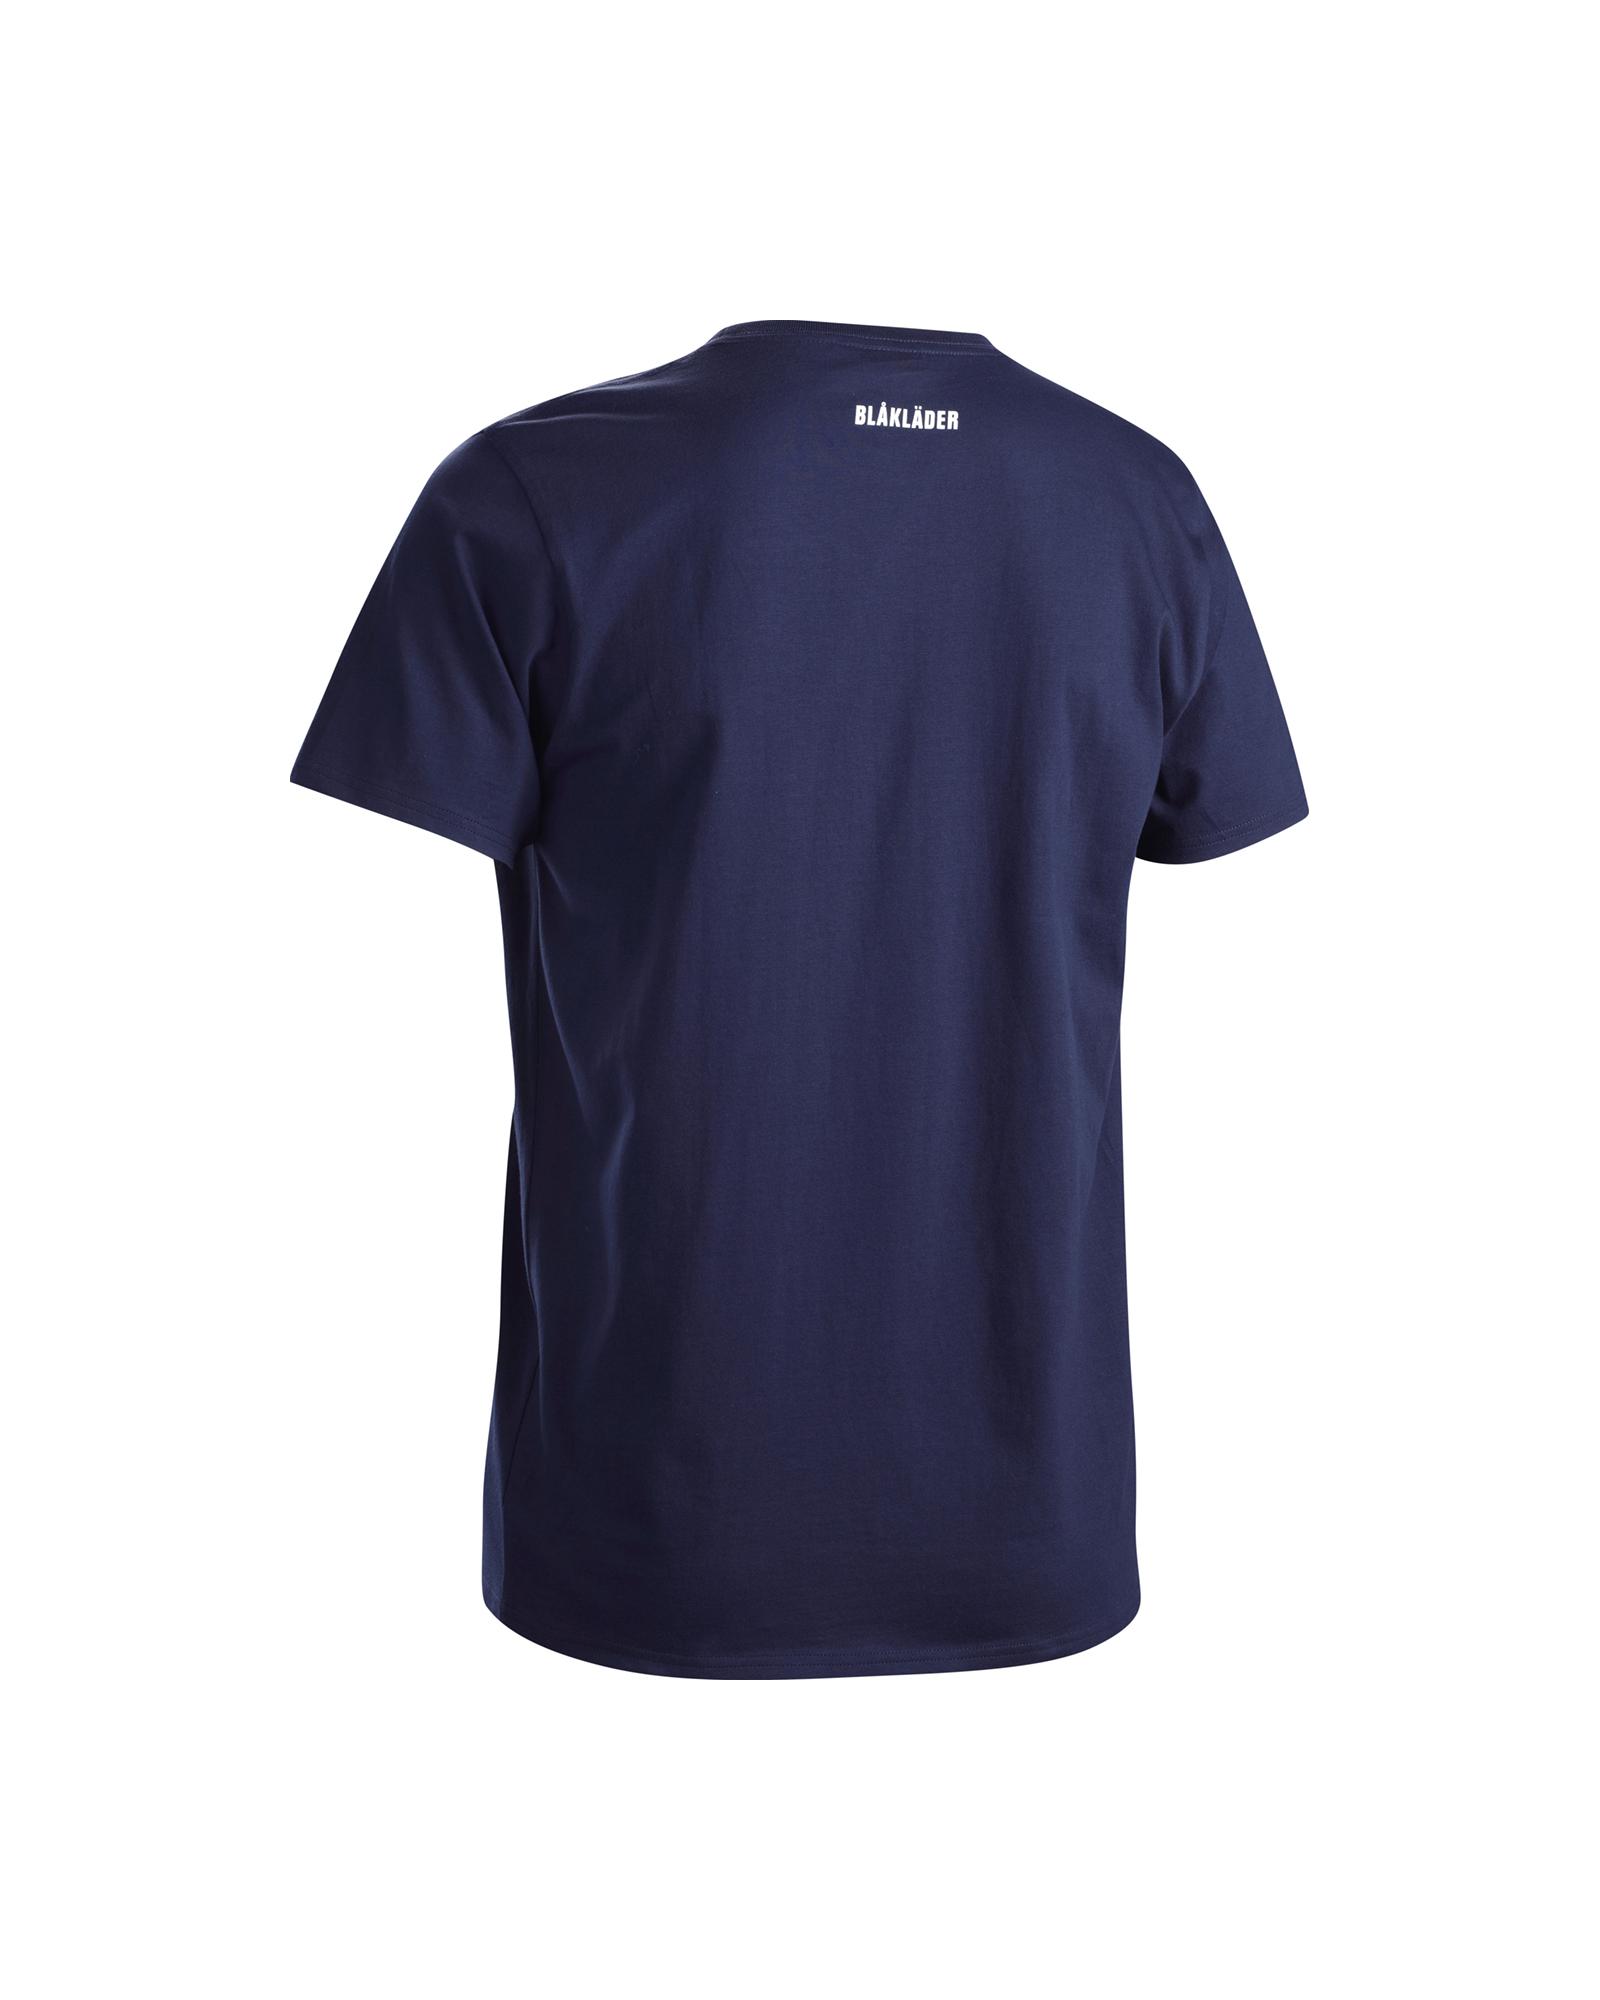 t shirt building site 90721042 bl kl der